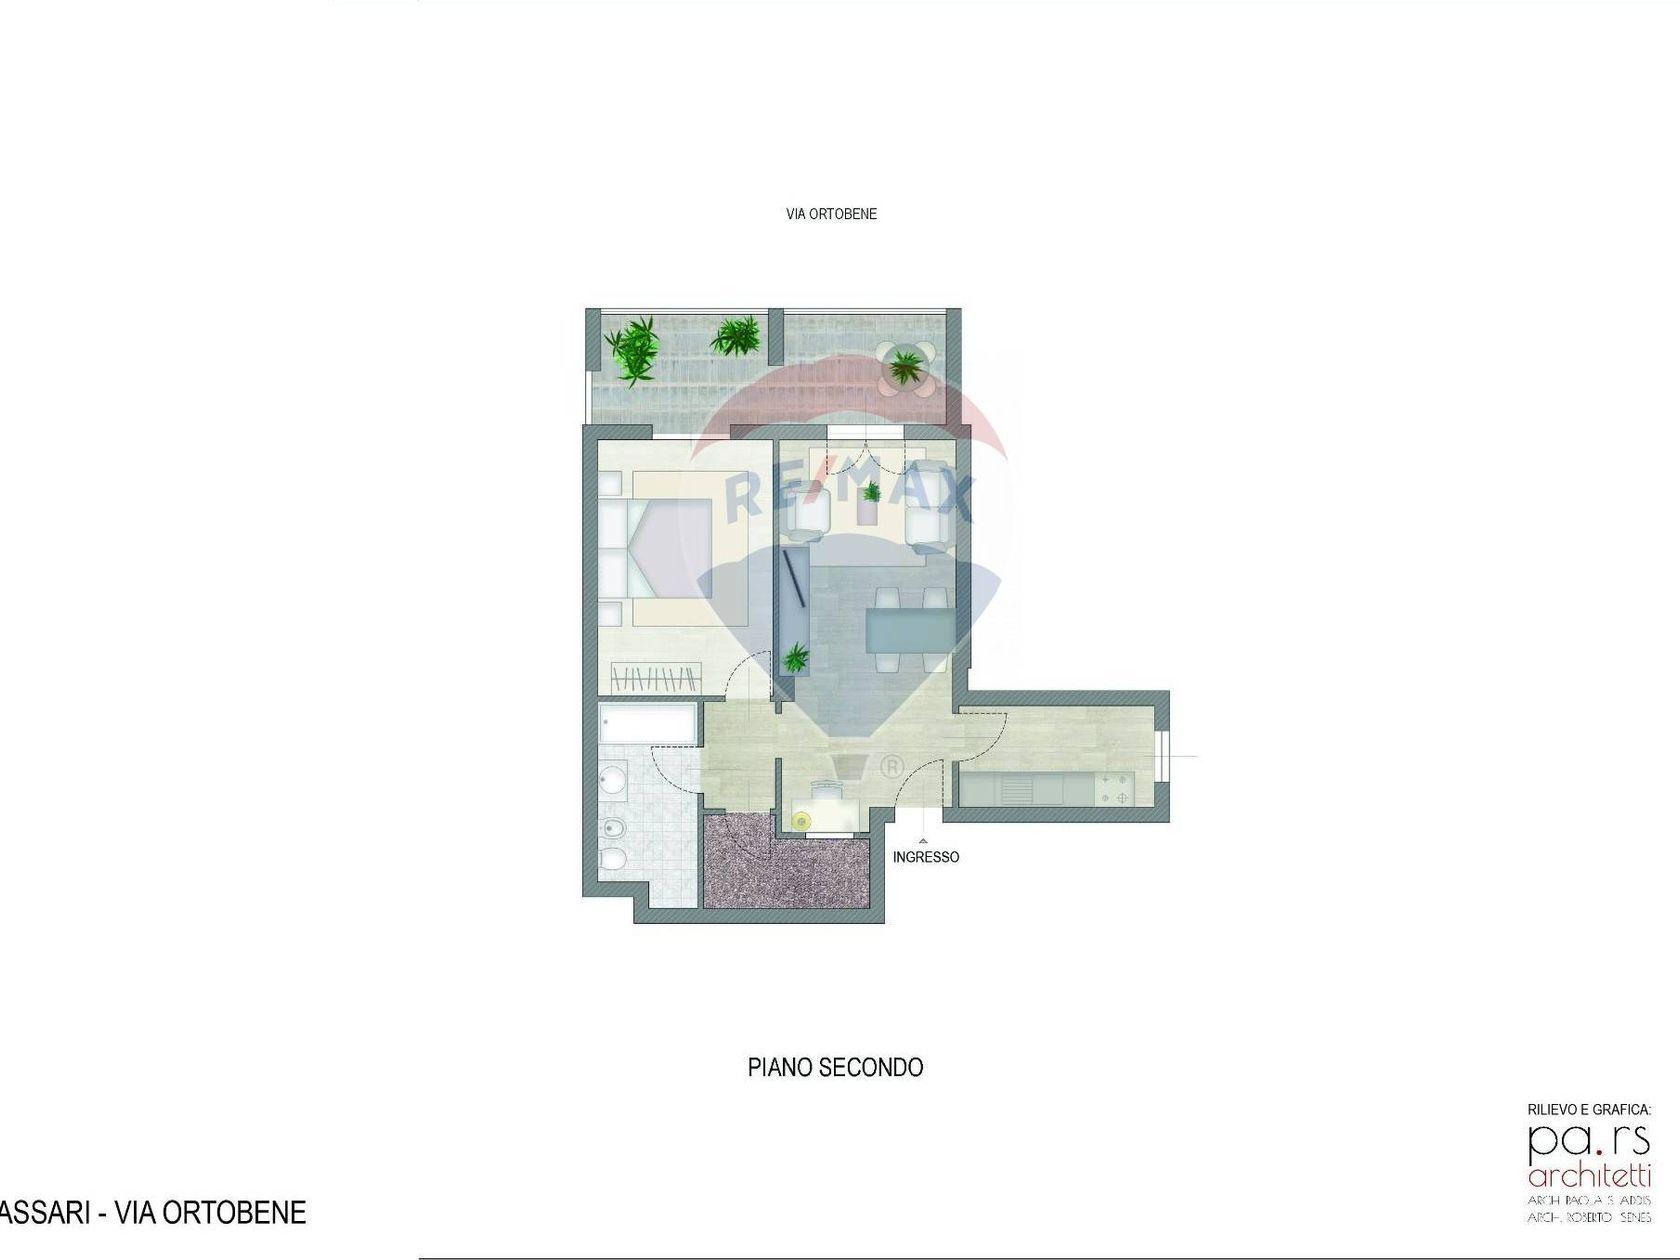 Appartamento Ss-s.orsola Nord, Sassari, SS Vendita - Planimetria 1